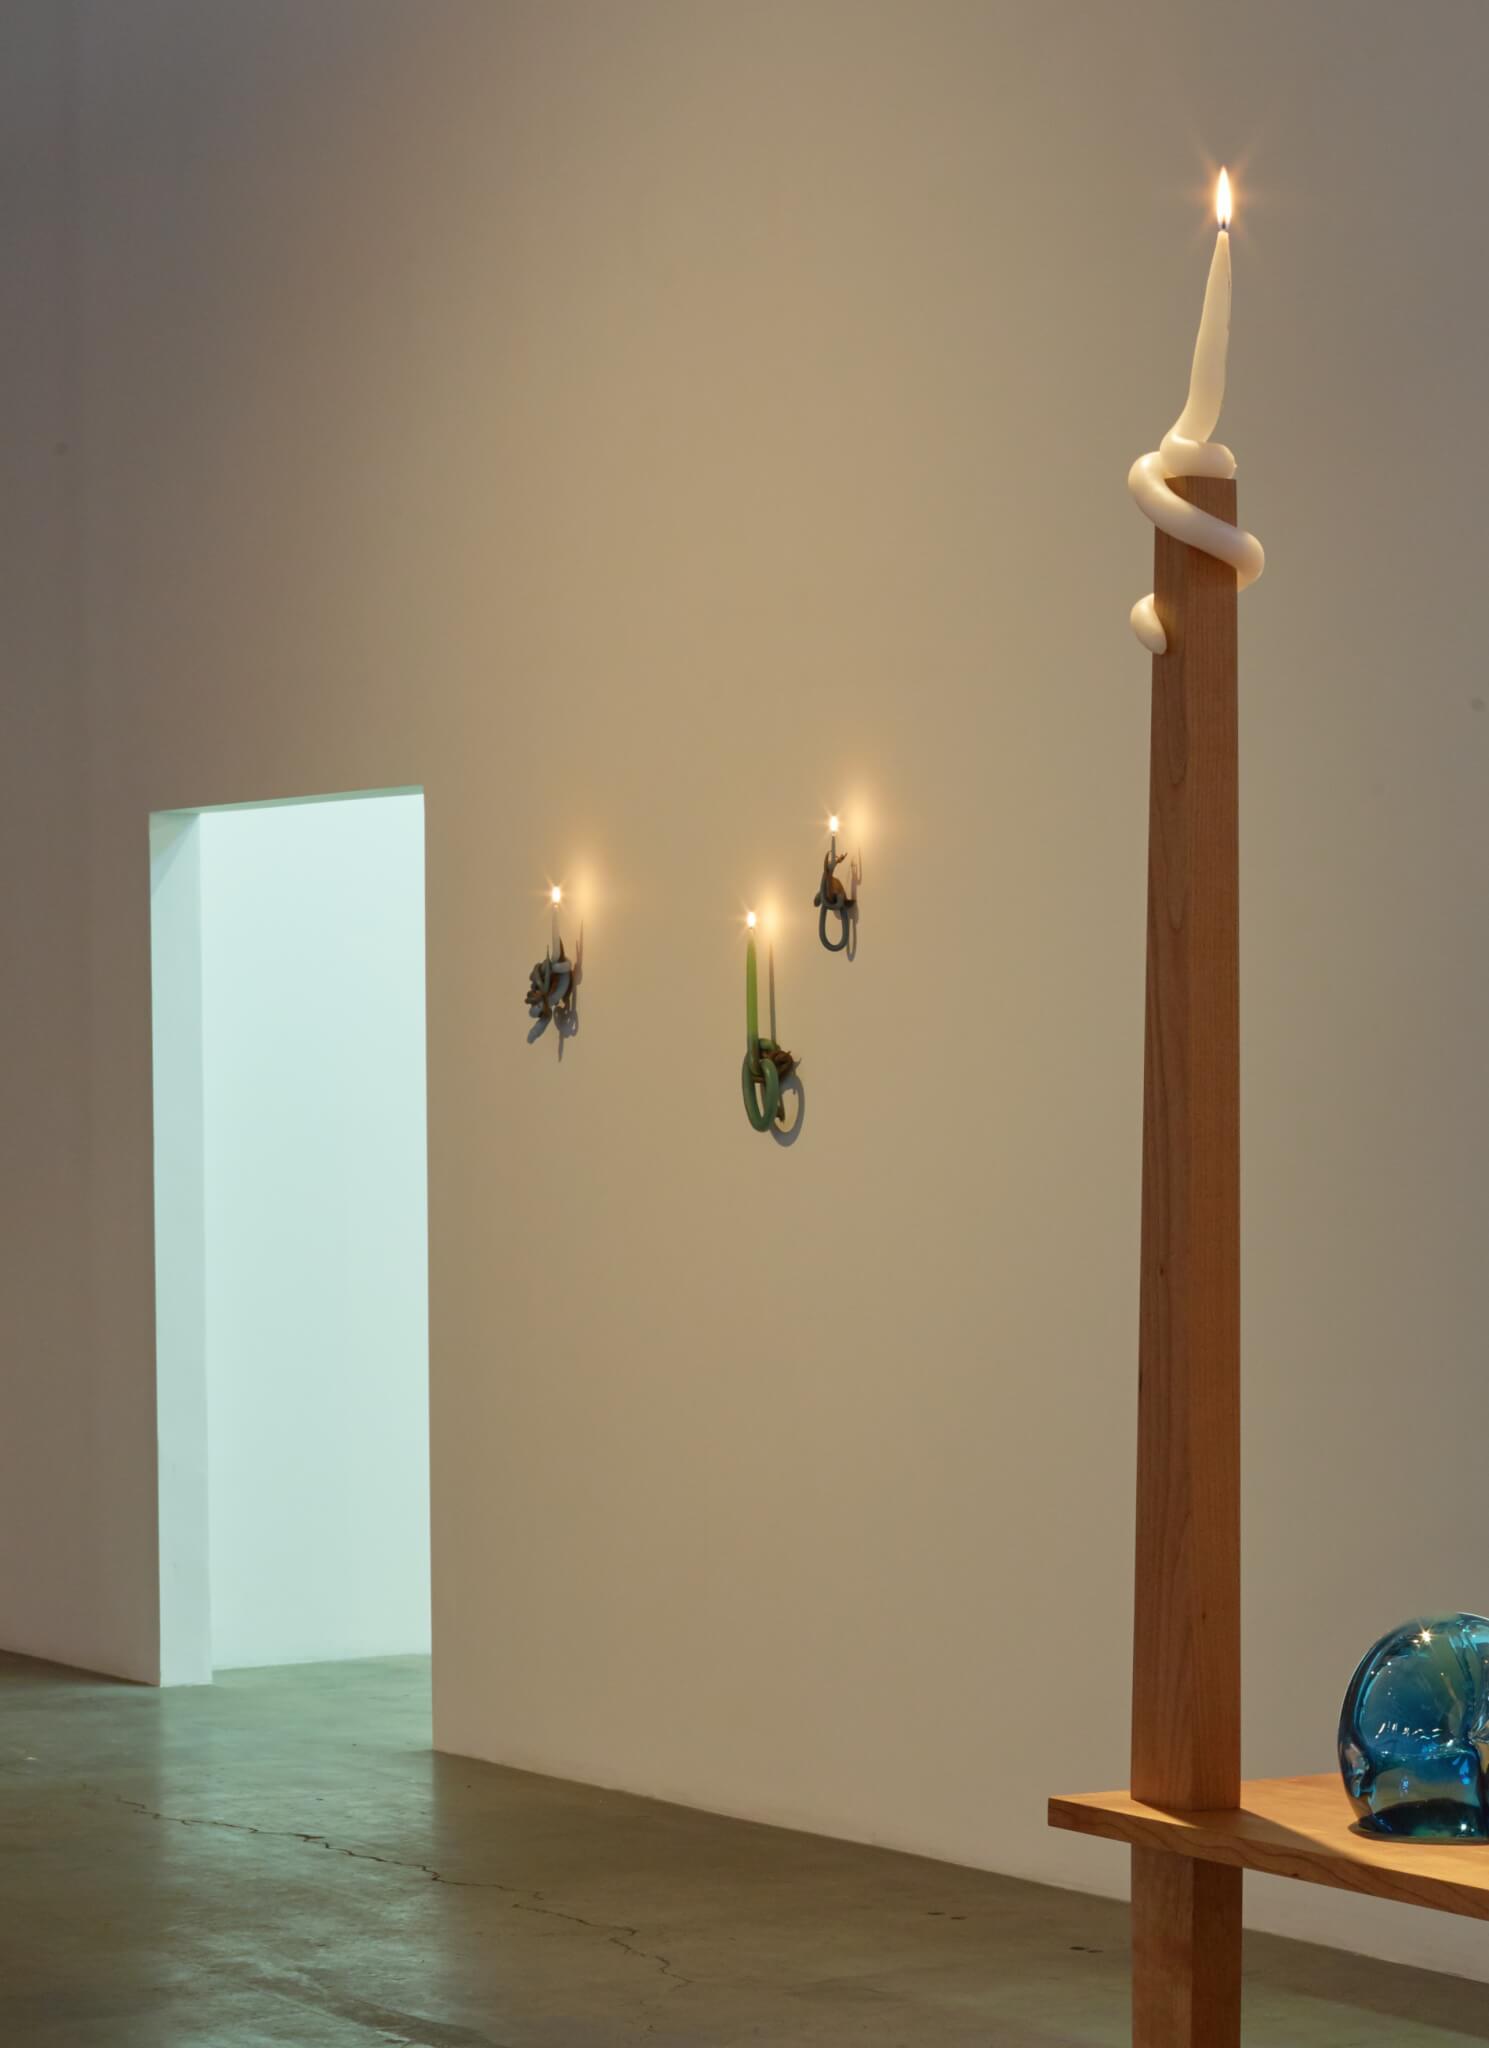 22_kelly-akashi-wall-candles-installation-2016